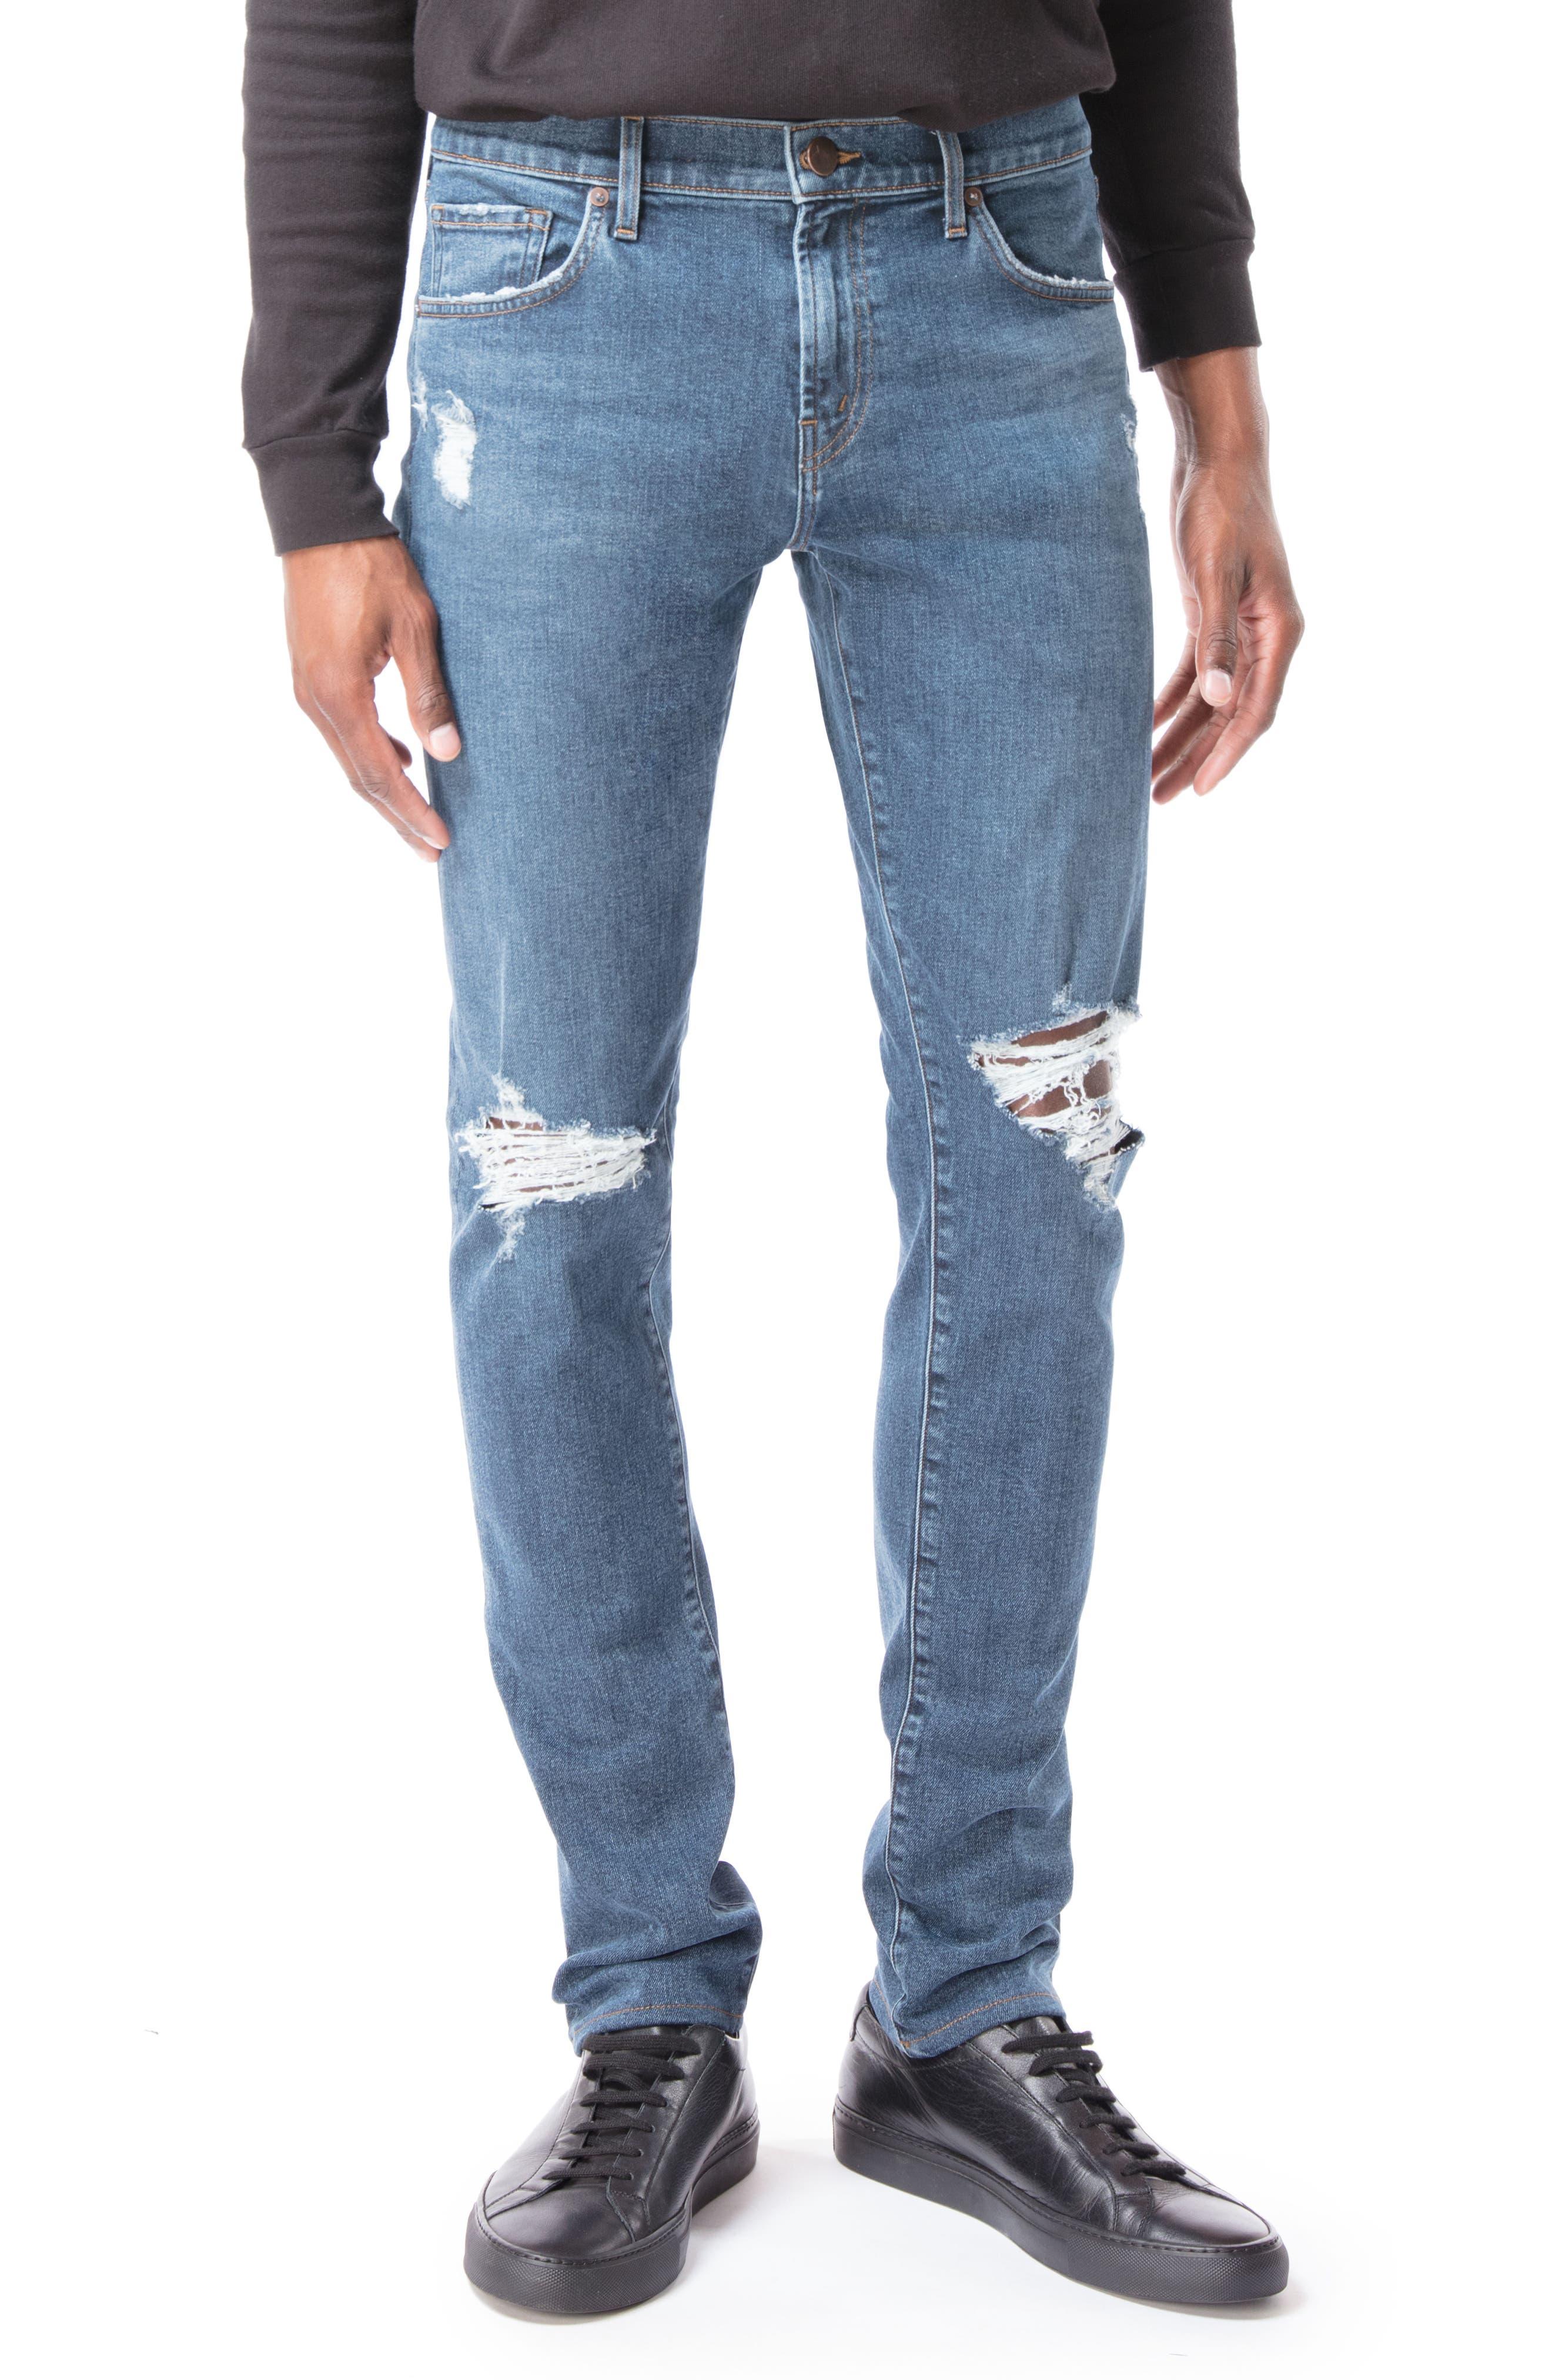 Mick Skinny Fit Jeans,                             Main thumbnail 1, color,                             494